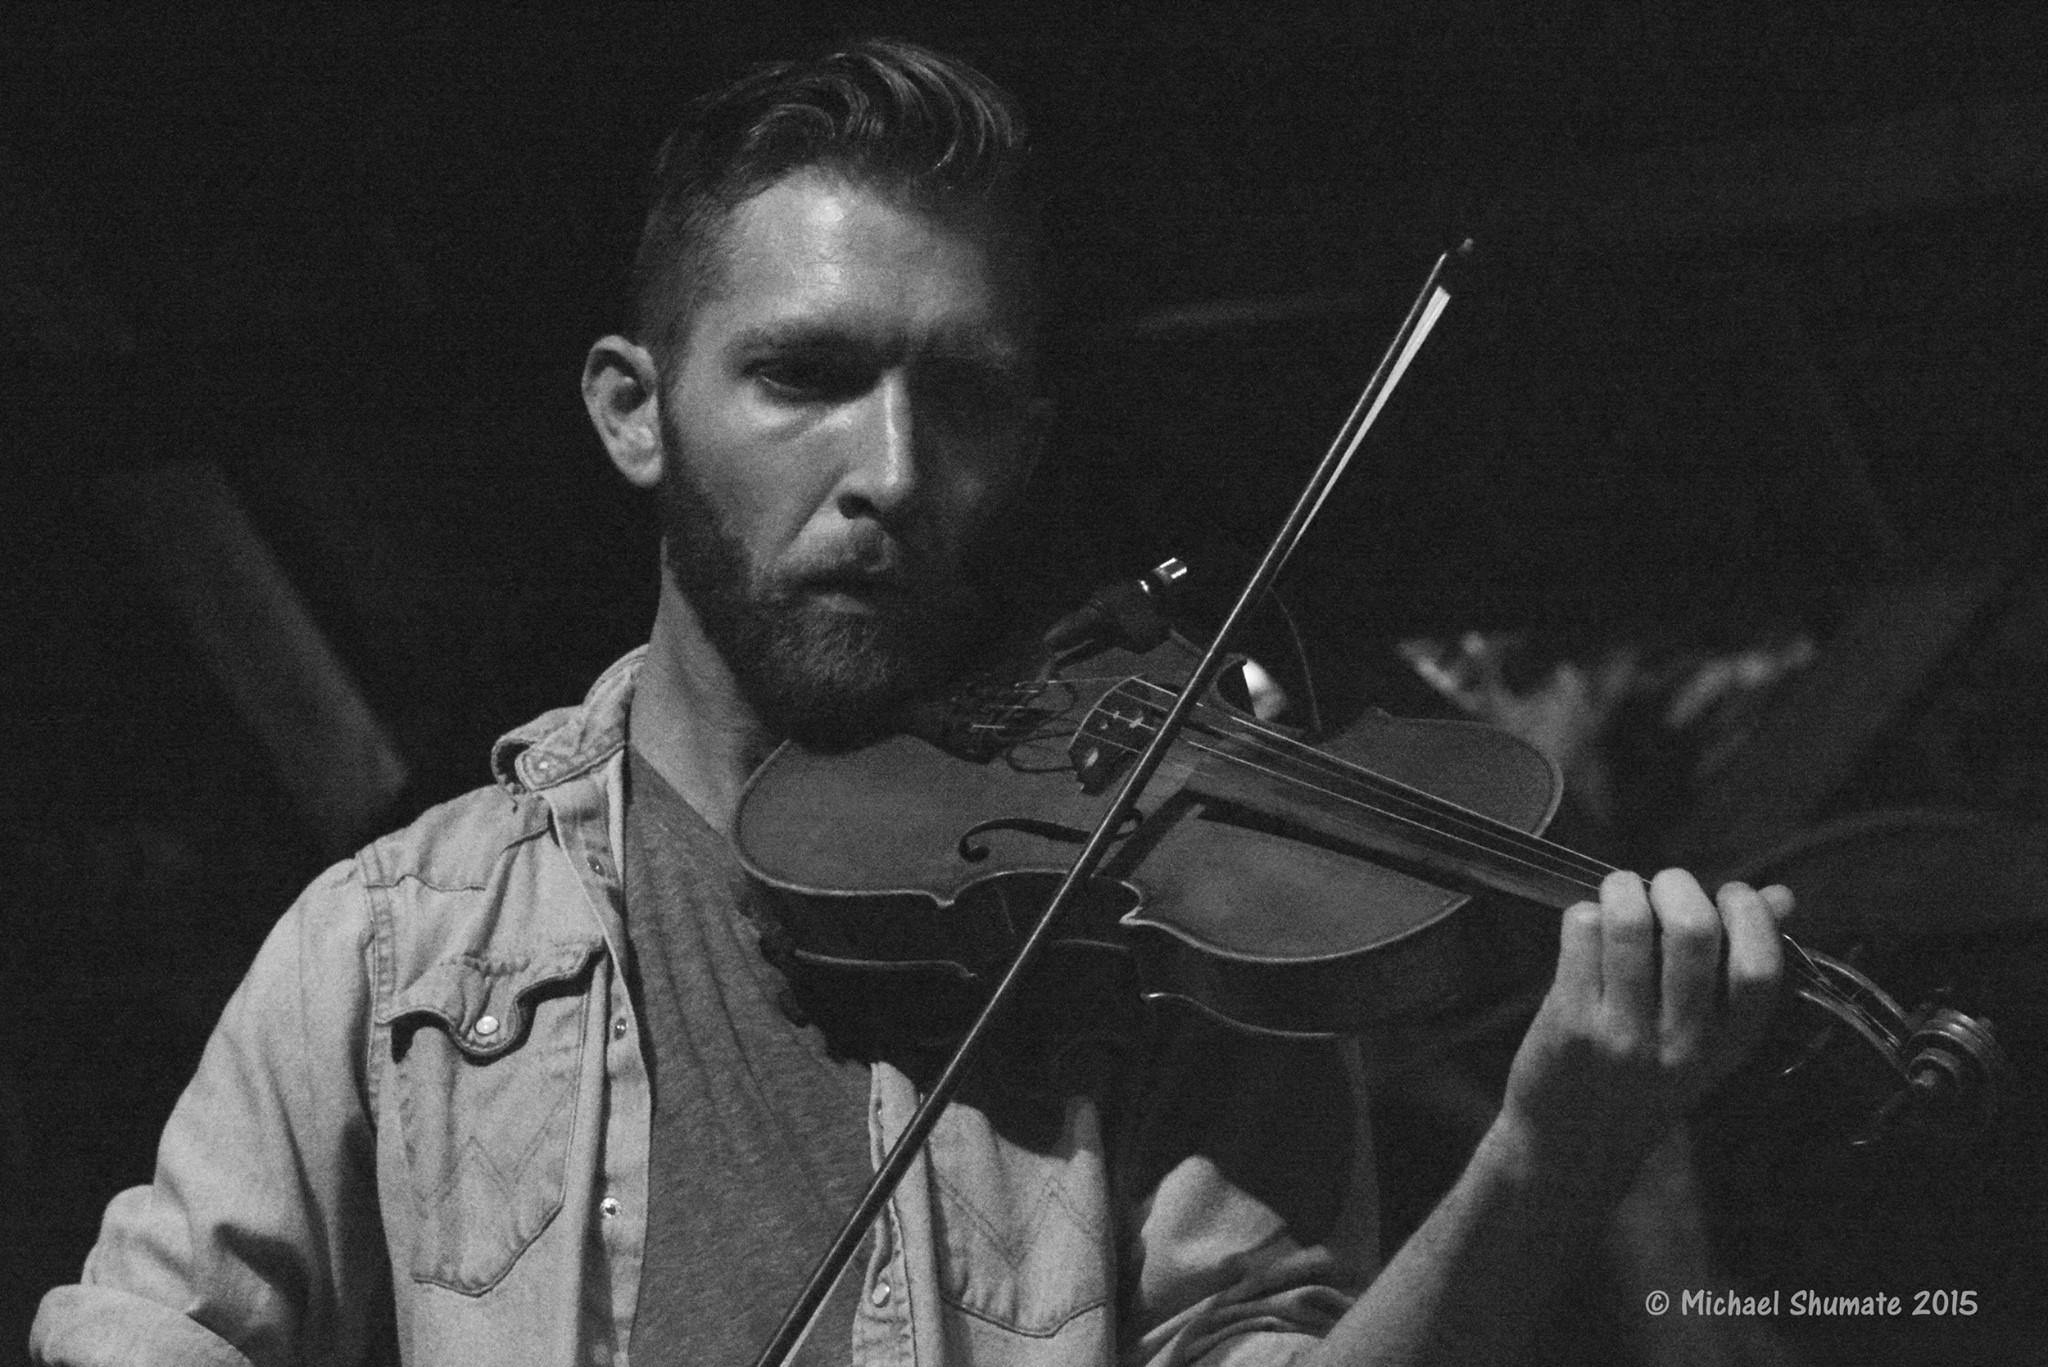 violin player fe 2015 by michael shumate